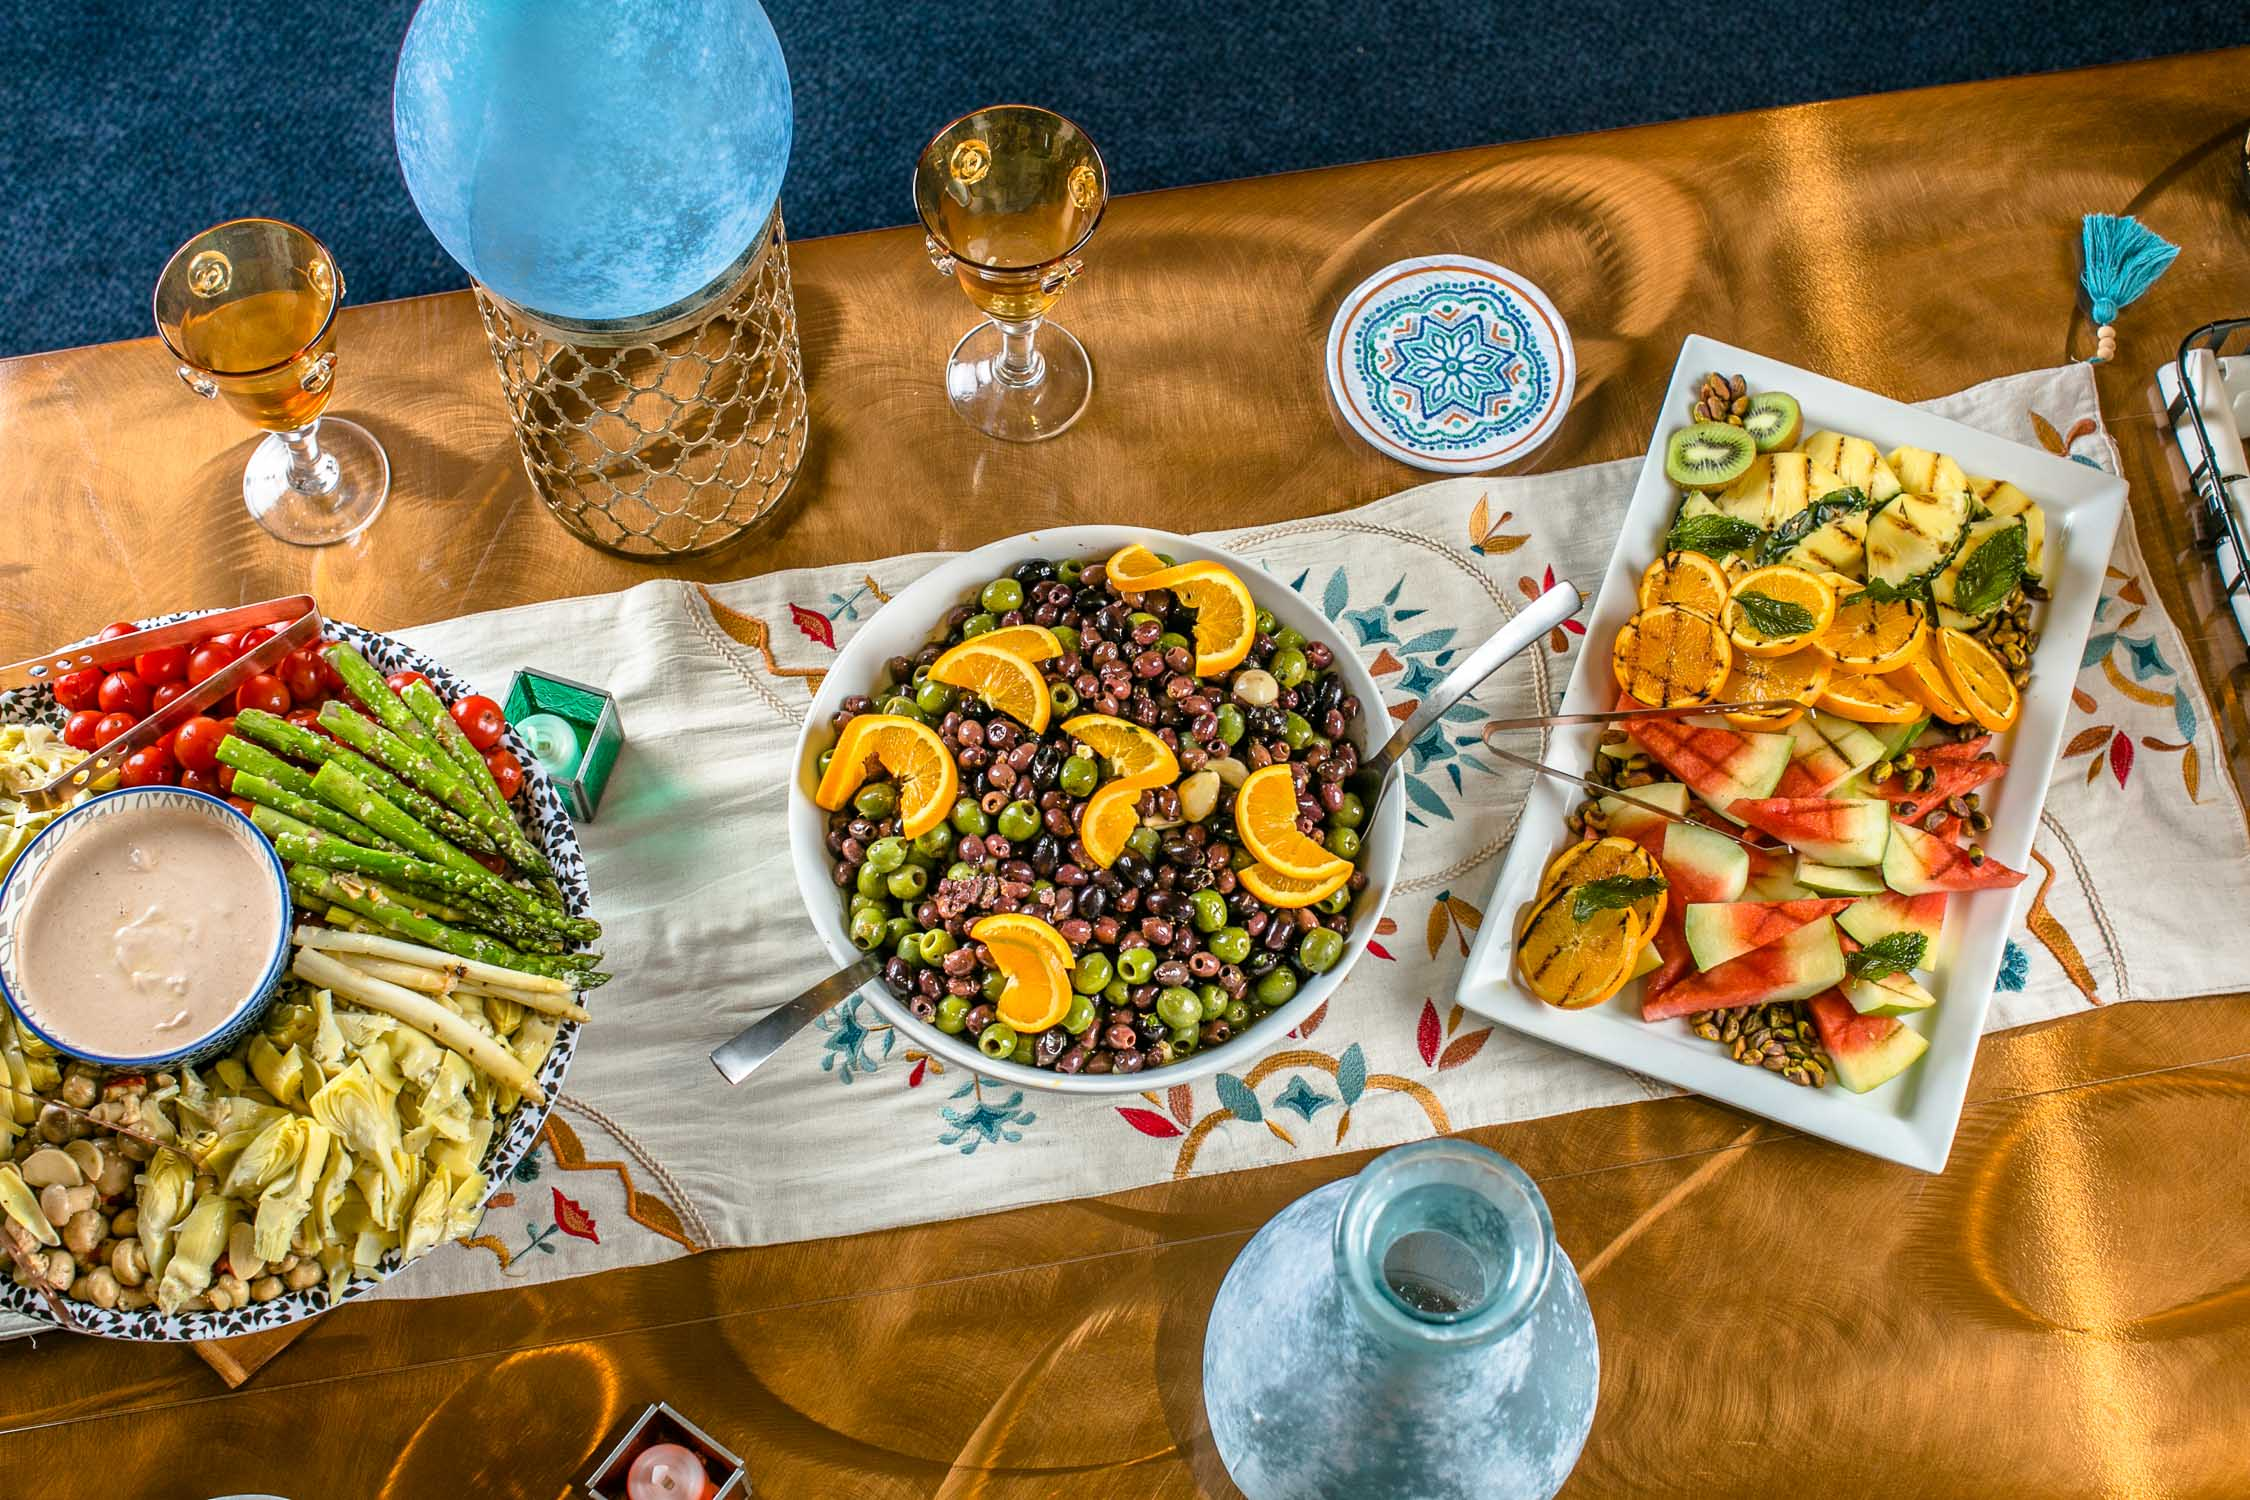 Marquee-Club-Fox-Theatre-Mezze-Table-Appetizers-Erik-Meadows